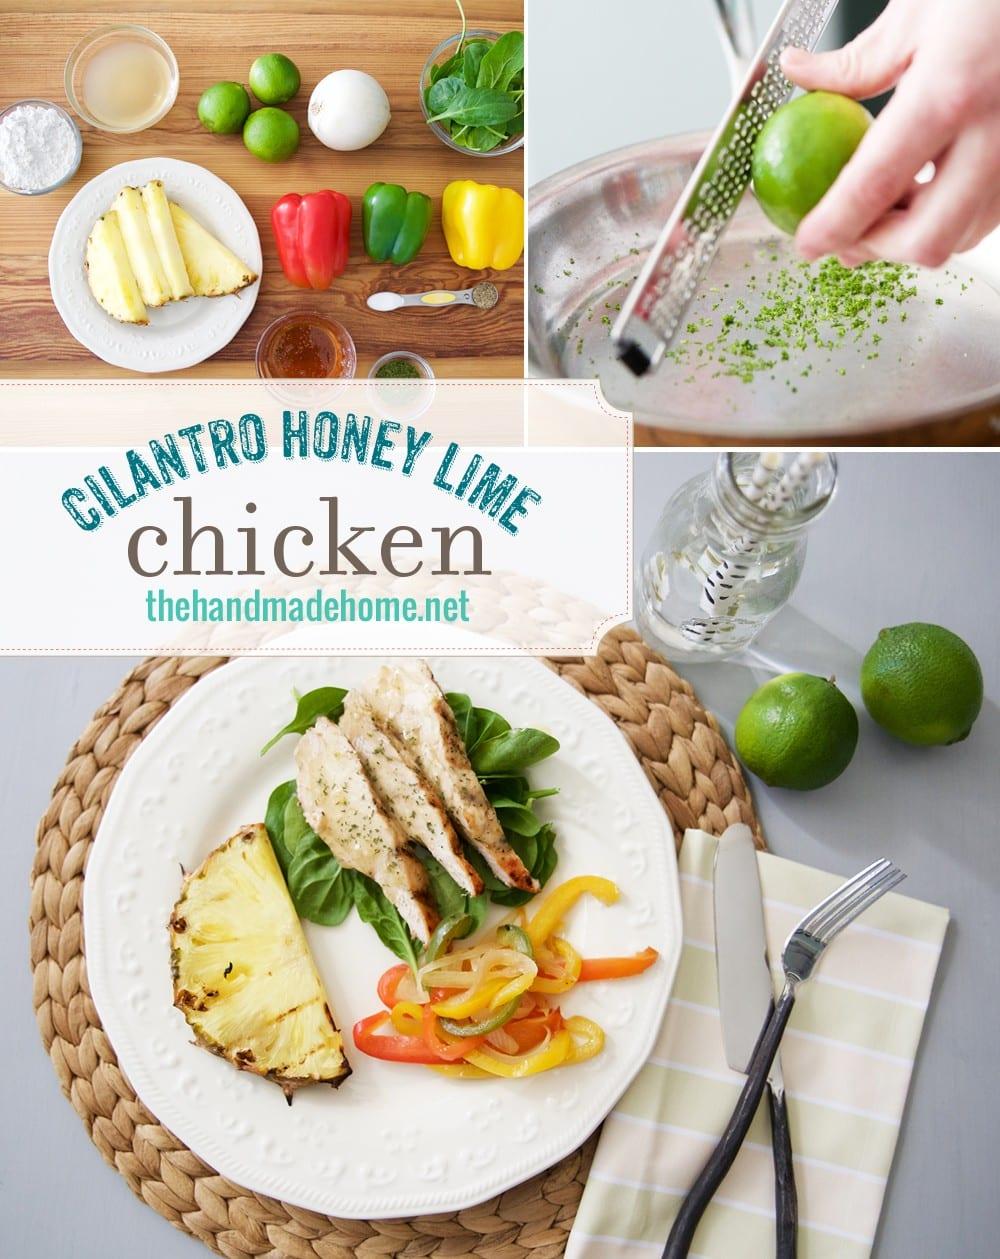 recipe_cilantro_honey_lime_chicken